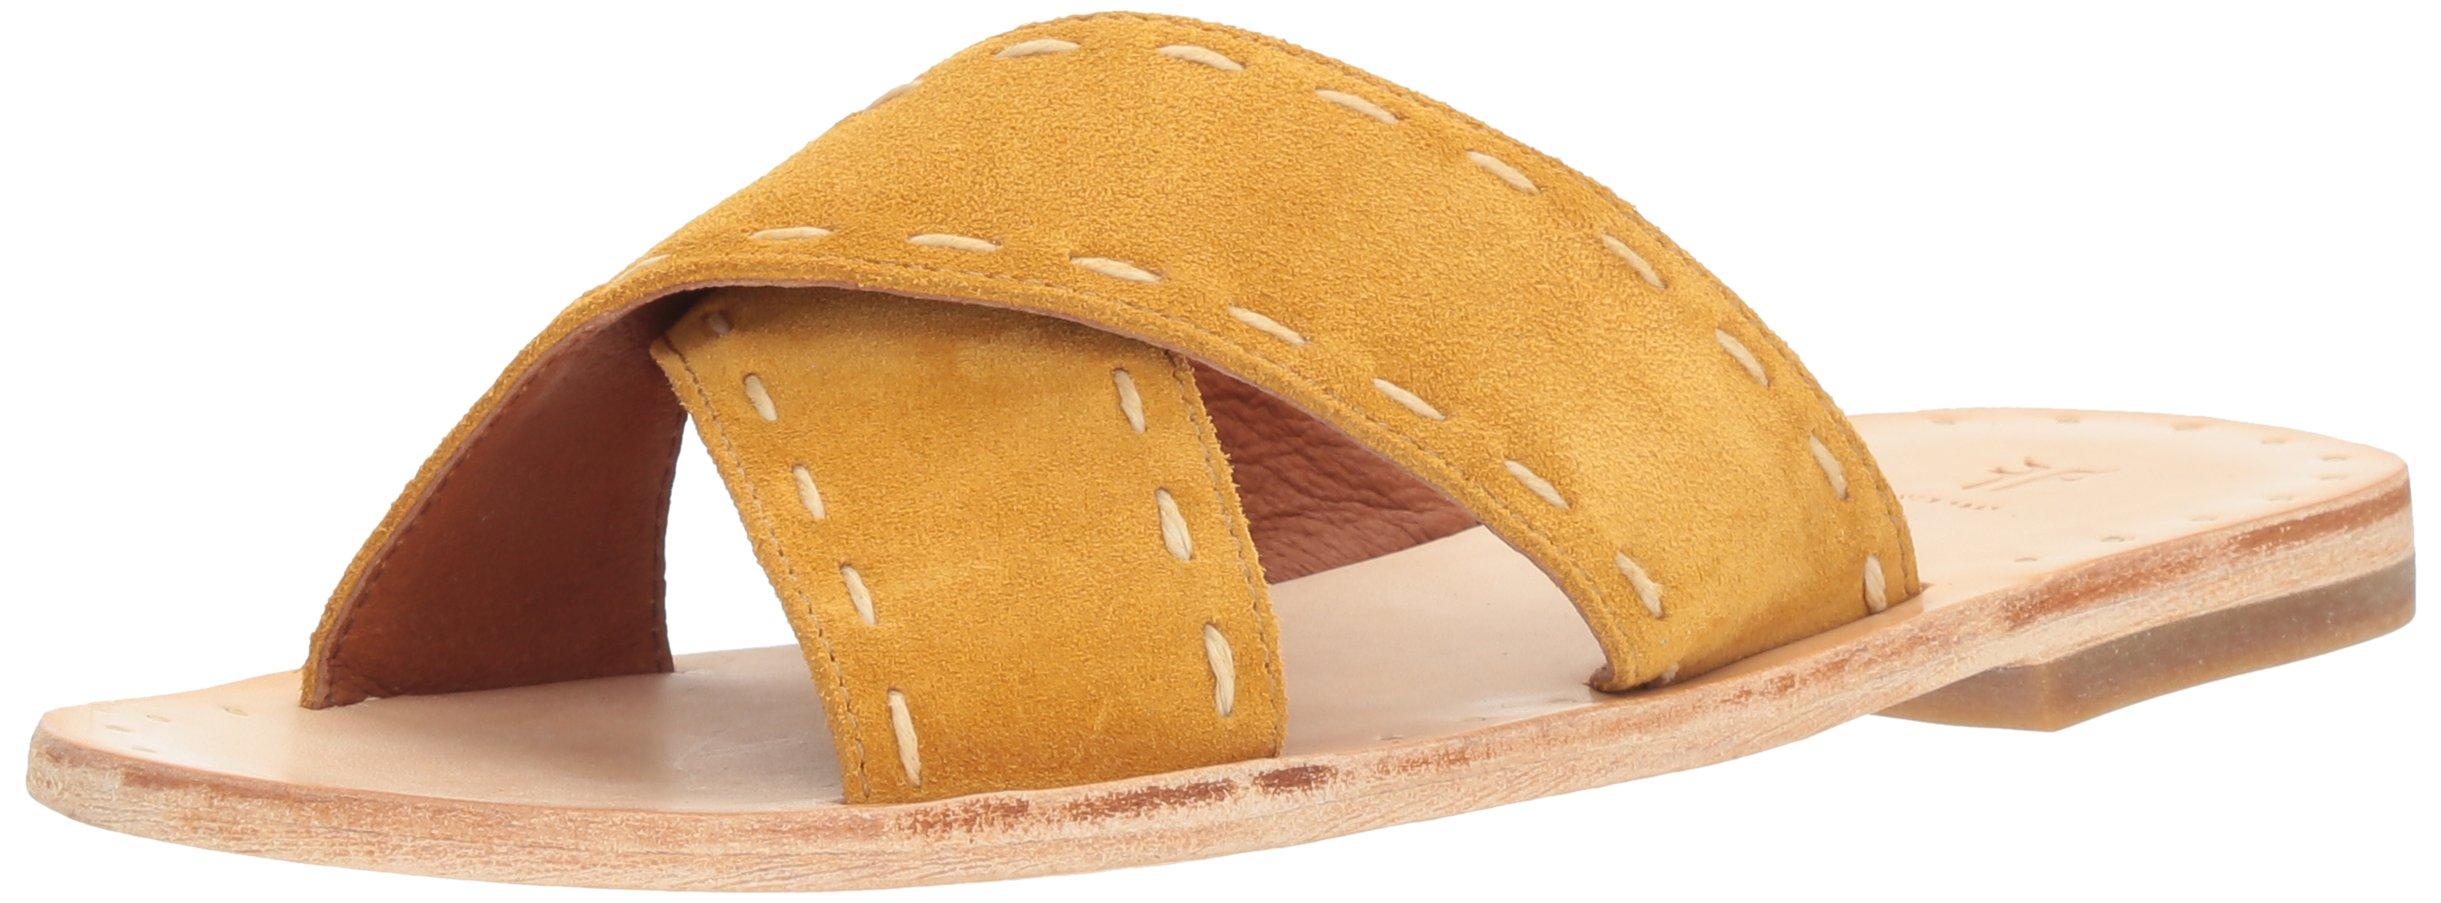 Frye Women's Avery Pickstitch Slide Flat Sandal